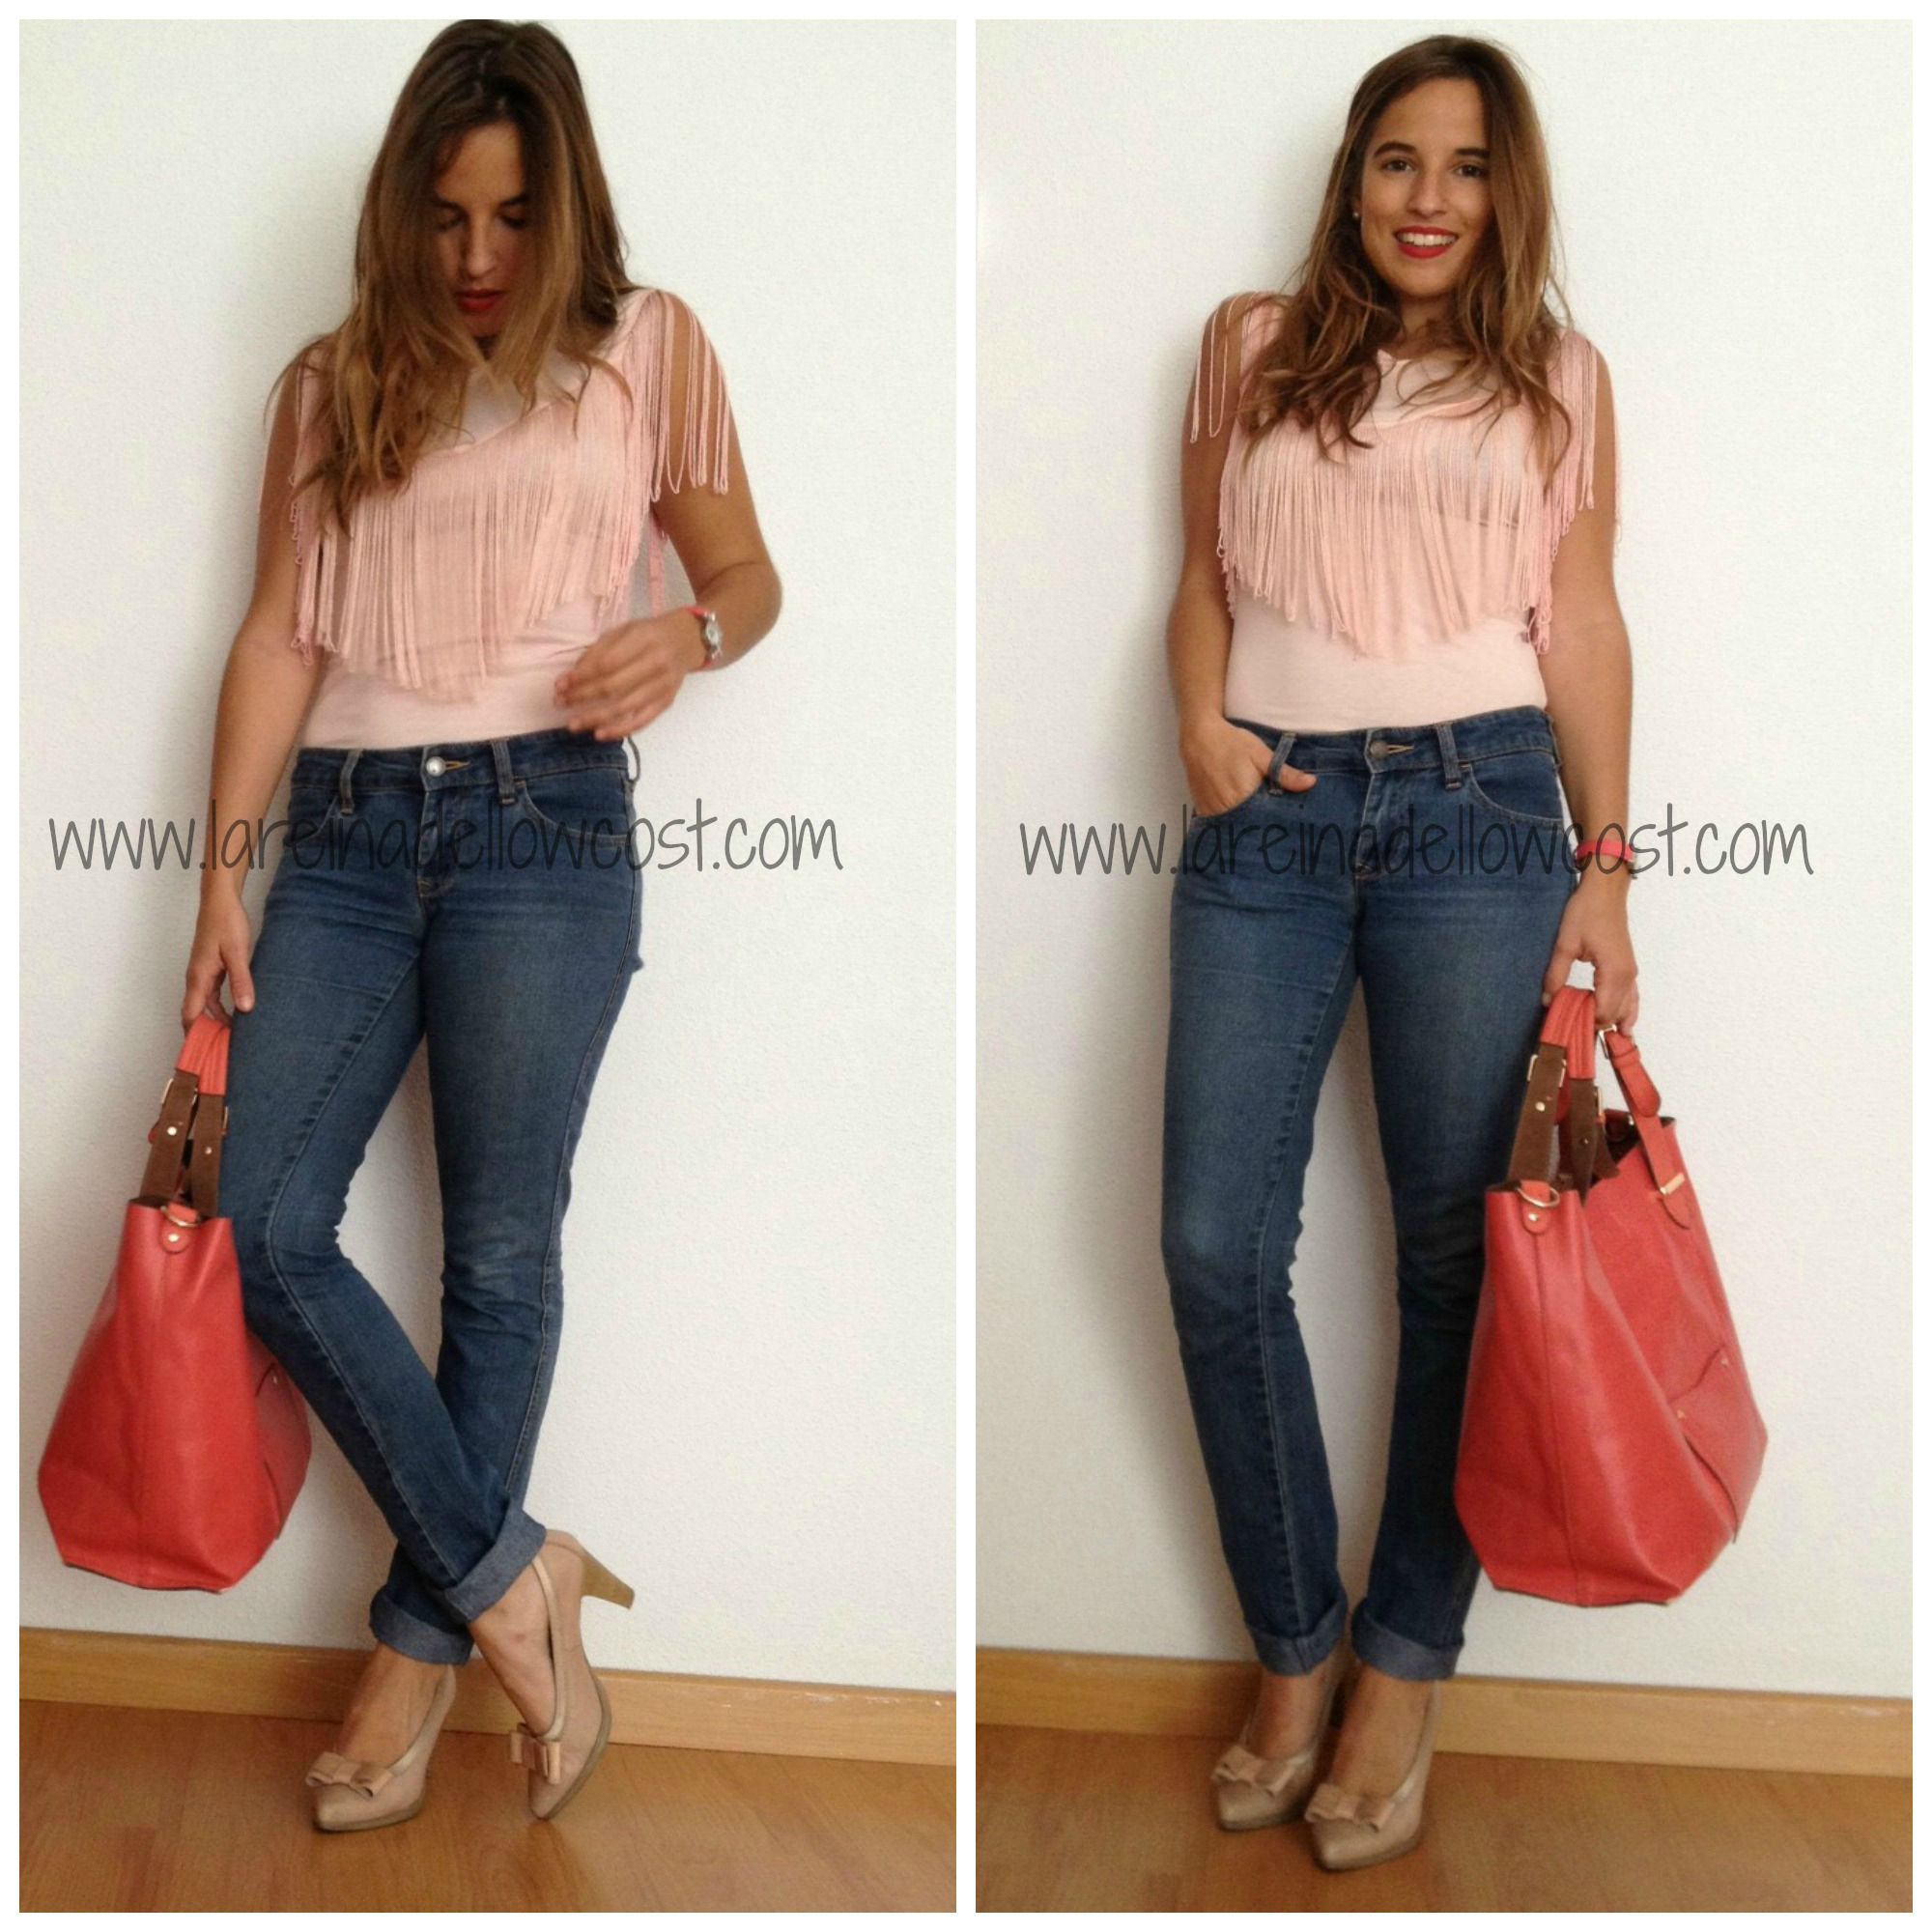 la-reina-del-low-cost-blog-de-moda-barata-style-outfit-look-para-ir-a-la-oficina-camiseta-flecos-look-festivalero-2014-que-guapa-shop-tienda-online-ropa-low-cost-pilar-pascual-del-riquel1.jpg